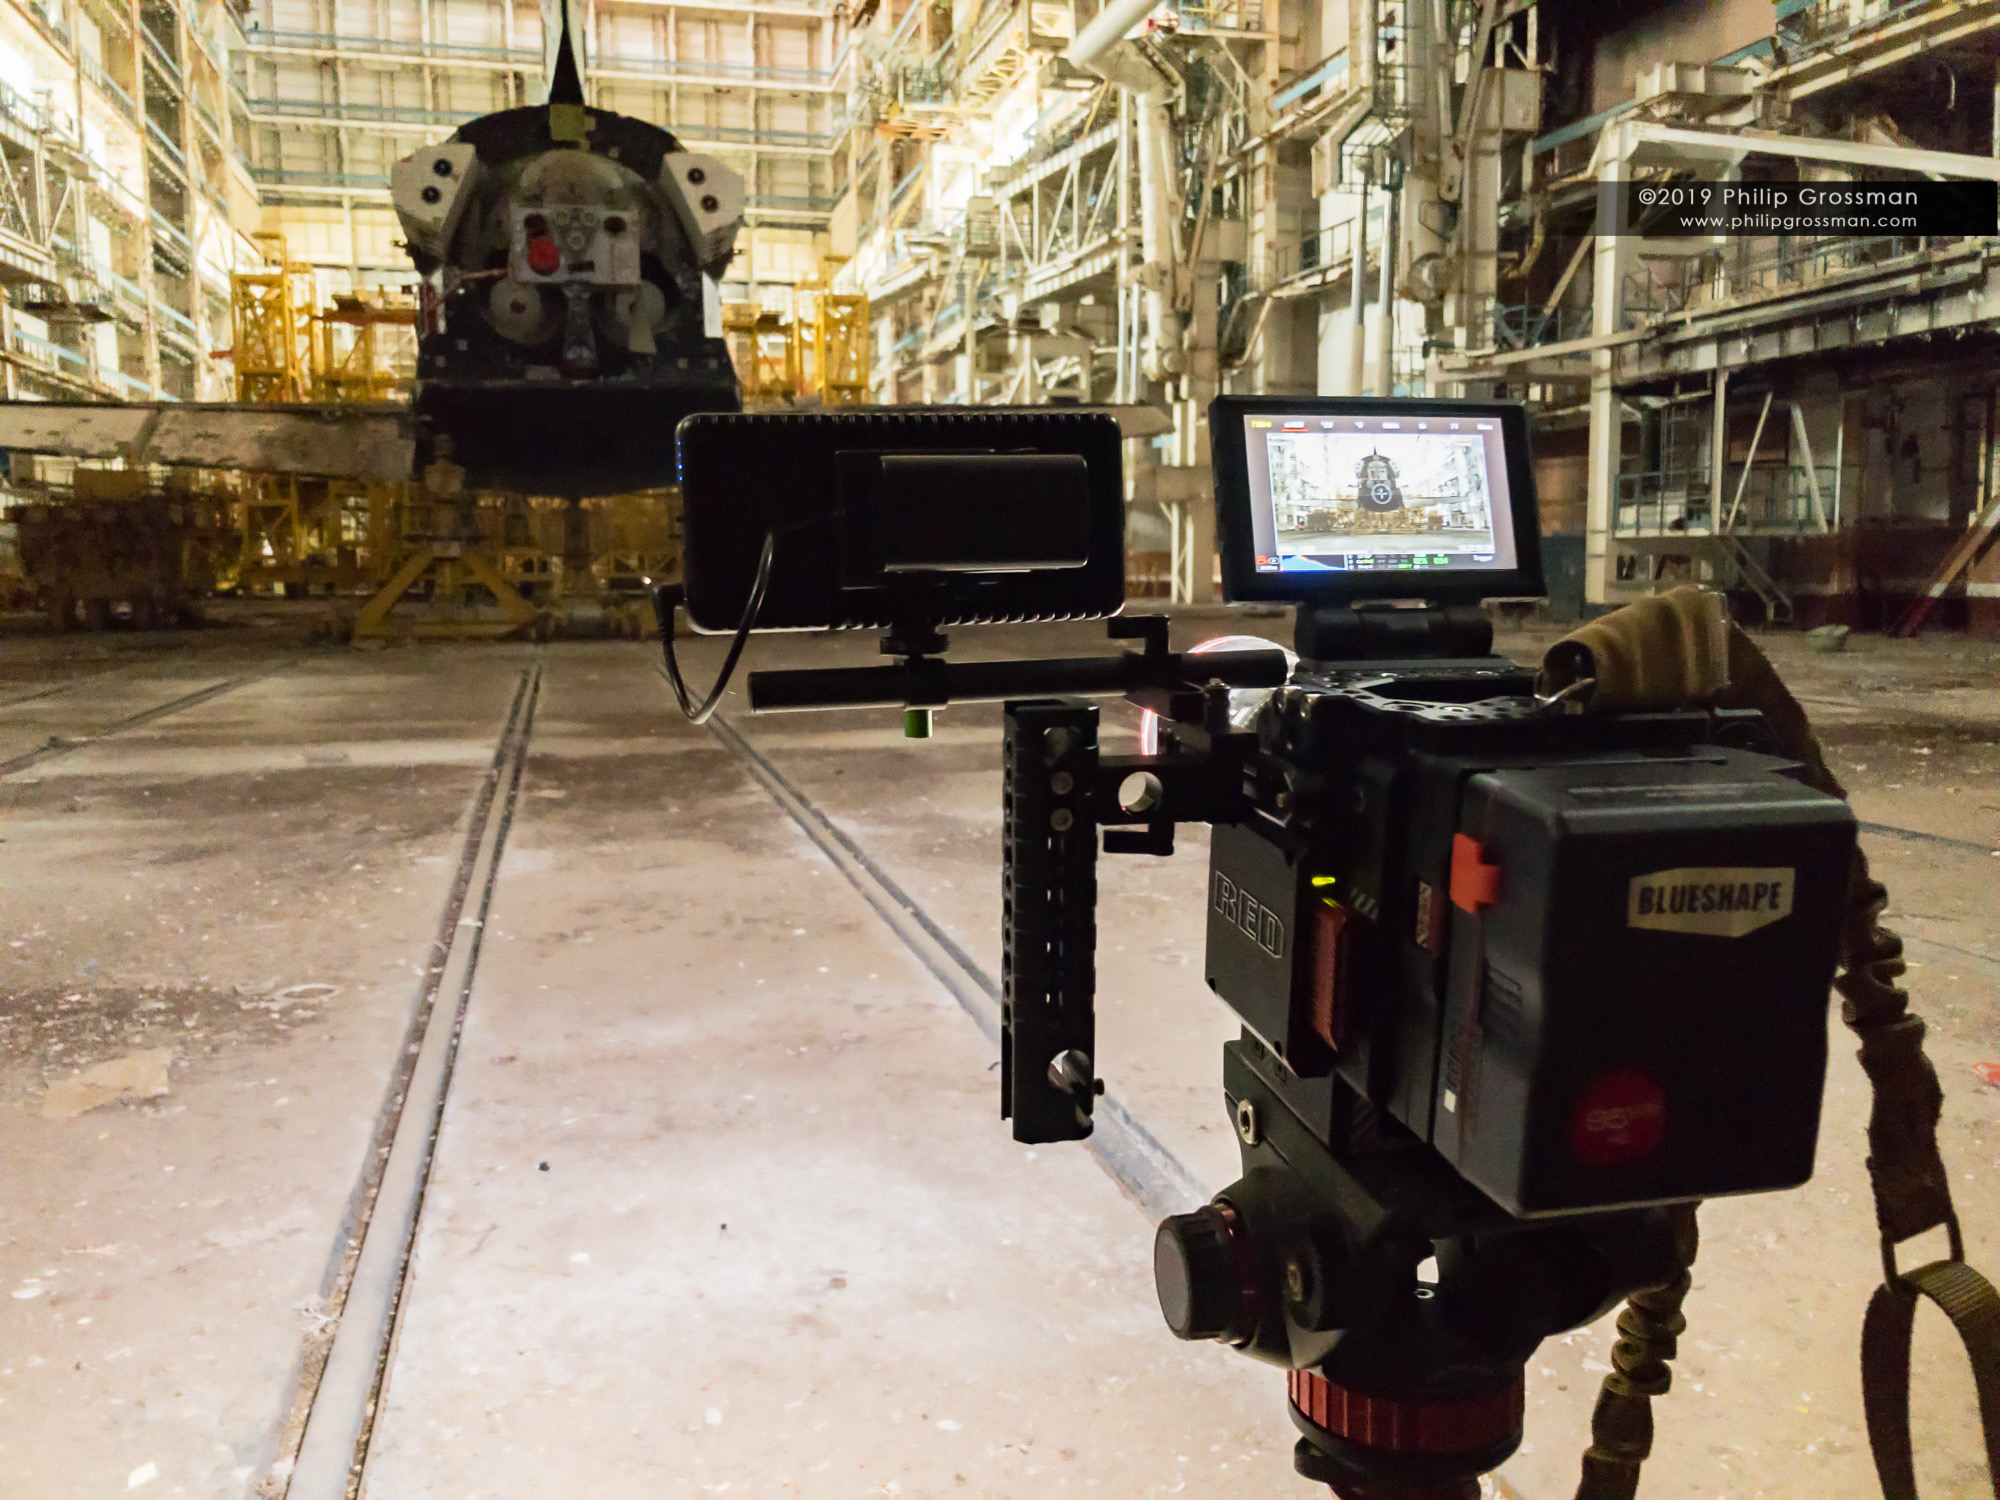 Philip filming inside the Energia-Buran Hazardous Servicing building in the Baikonur Cosmodrome